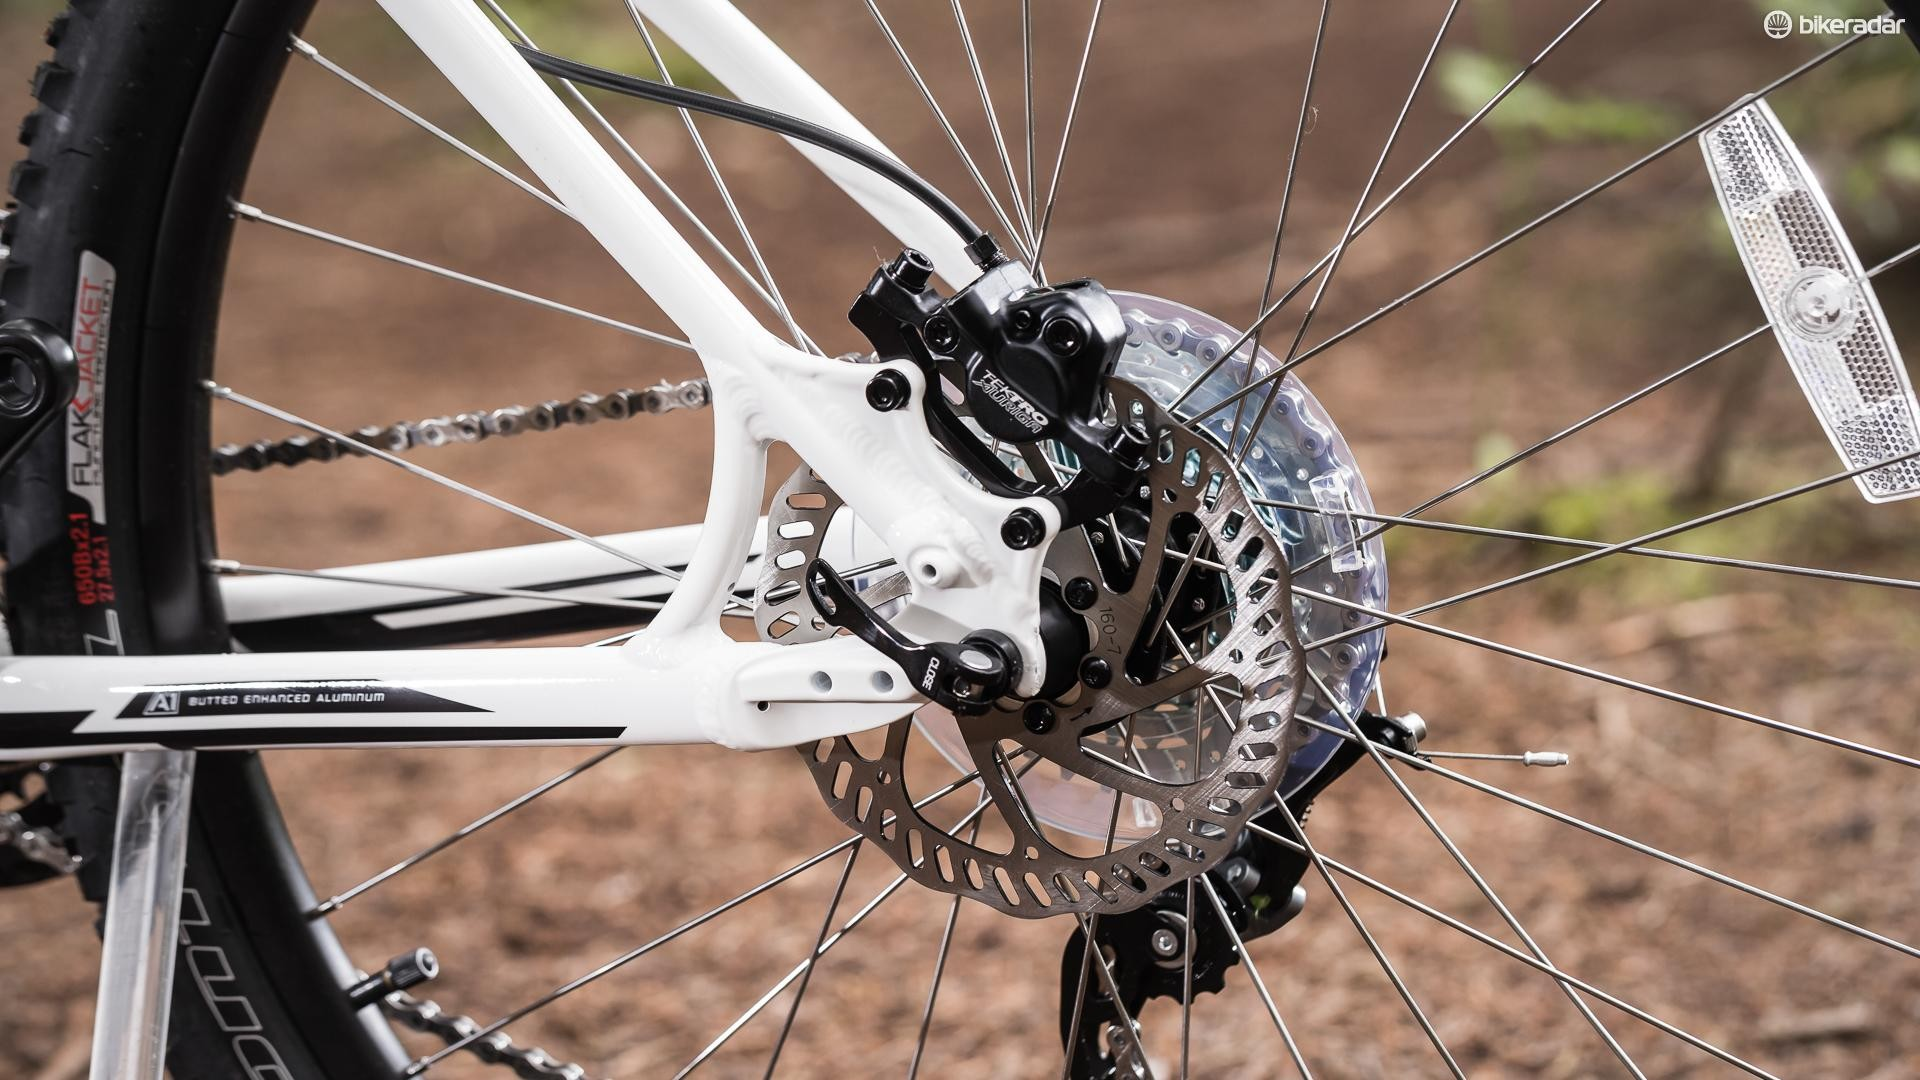 The Tektro hydraulic disc brakes lack feel and power